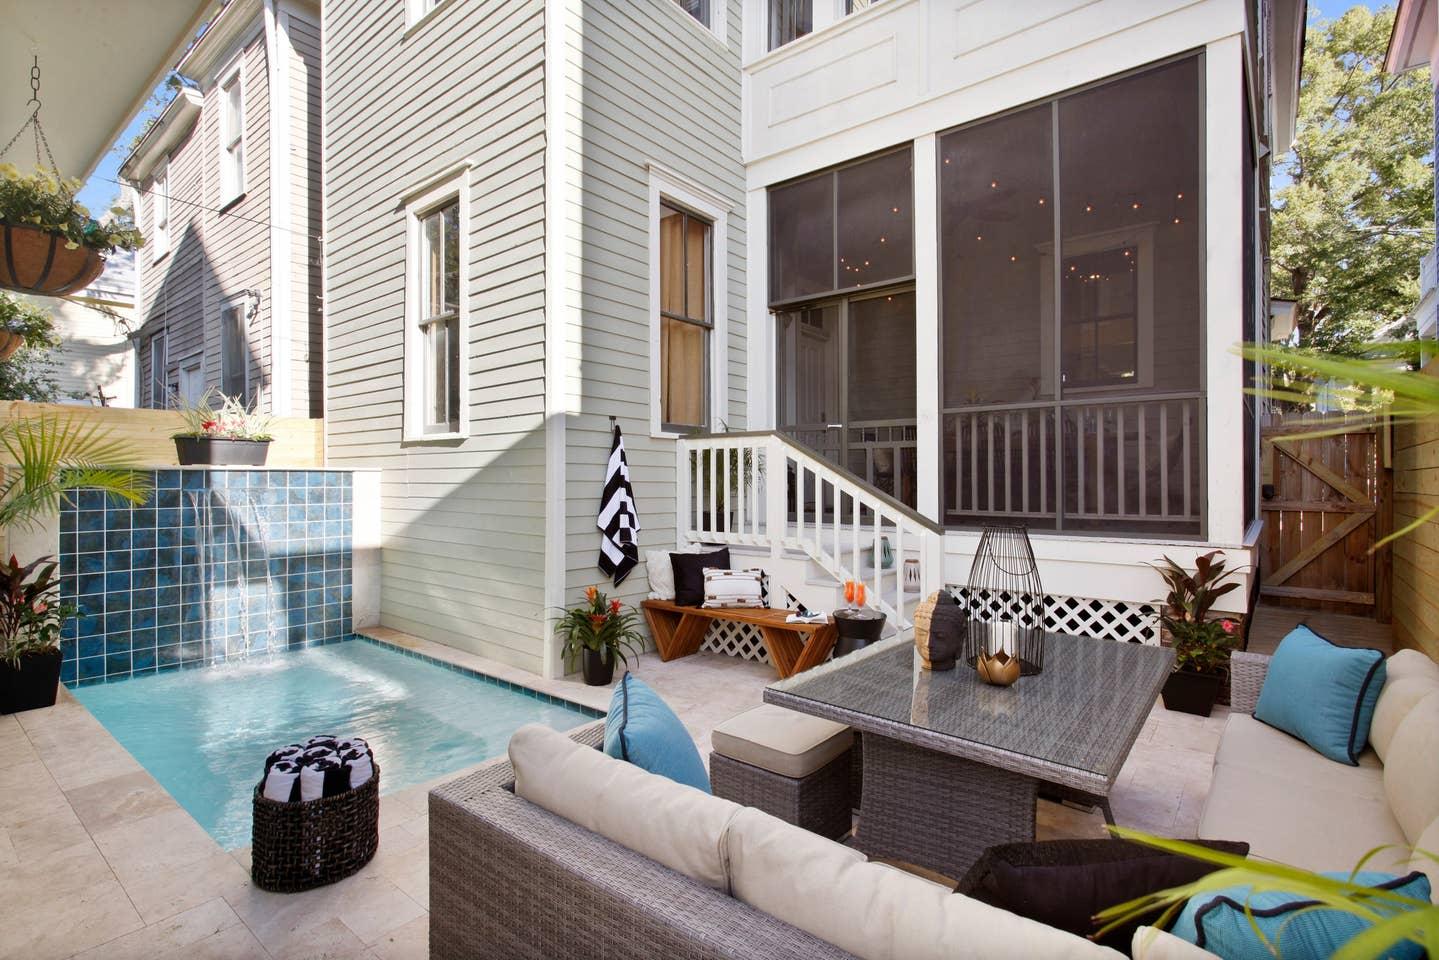 Airbnb Savannah GA with pool